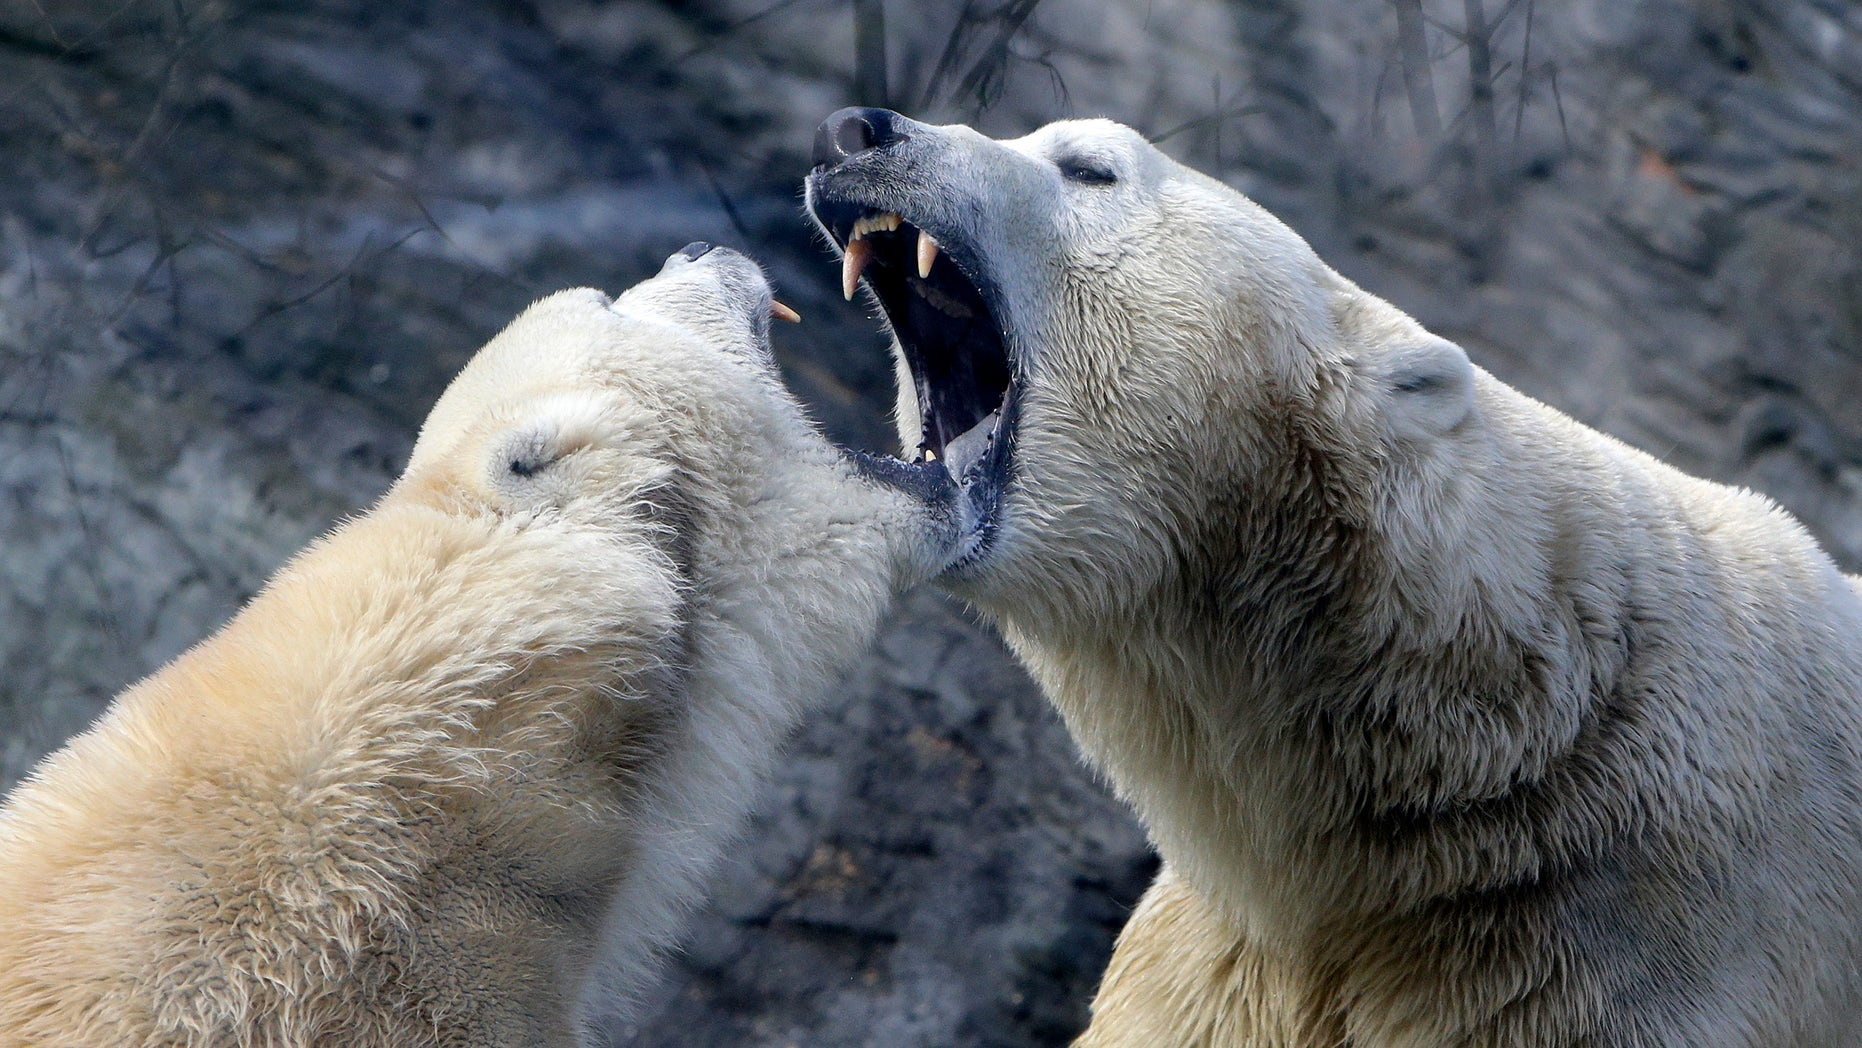 Polar bears play inside their enclosure at Prague Zoo, Czech Republic, February 24, 2016. (REUTERS/David W Cerny)